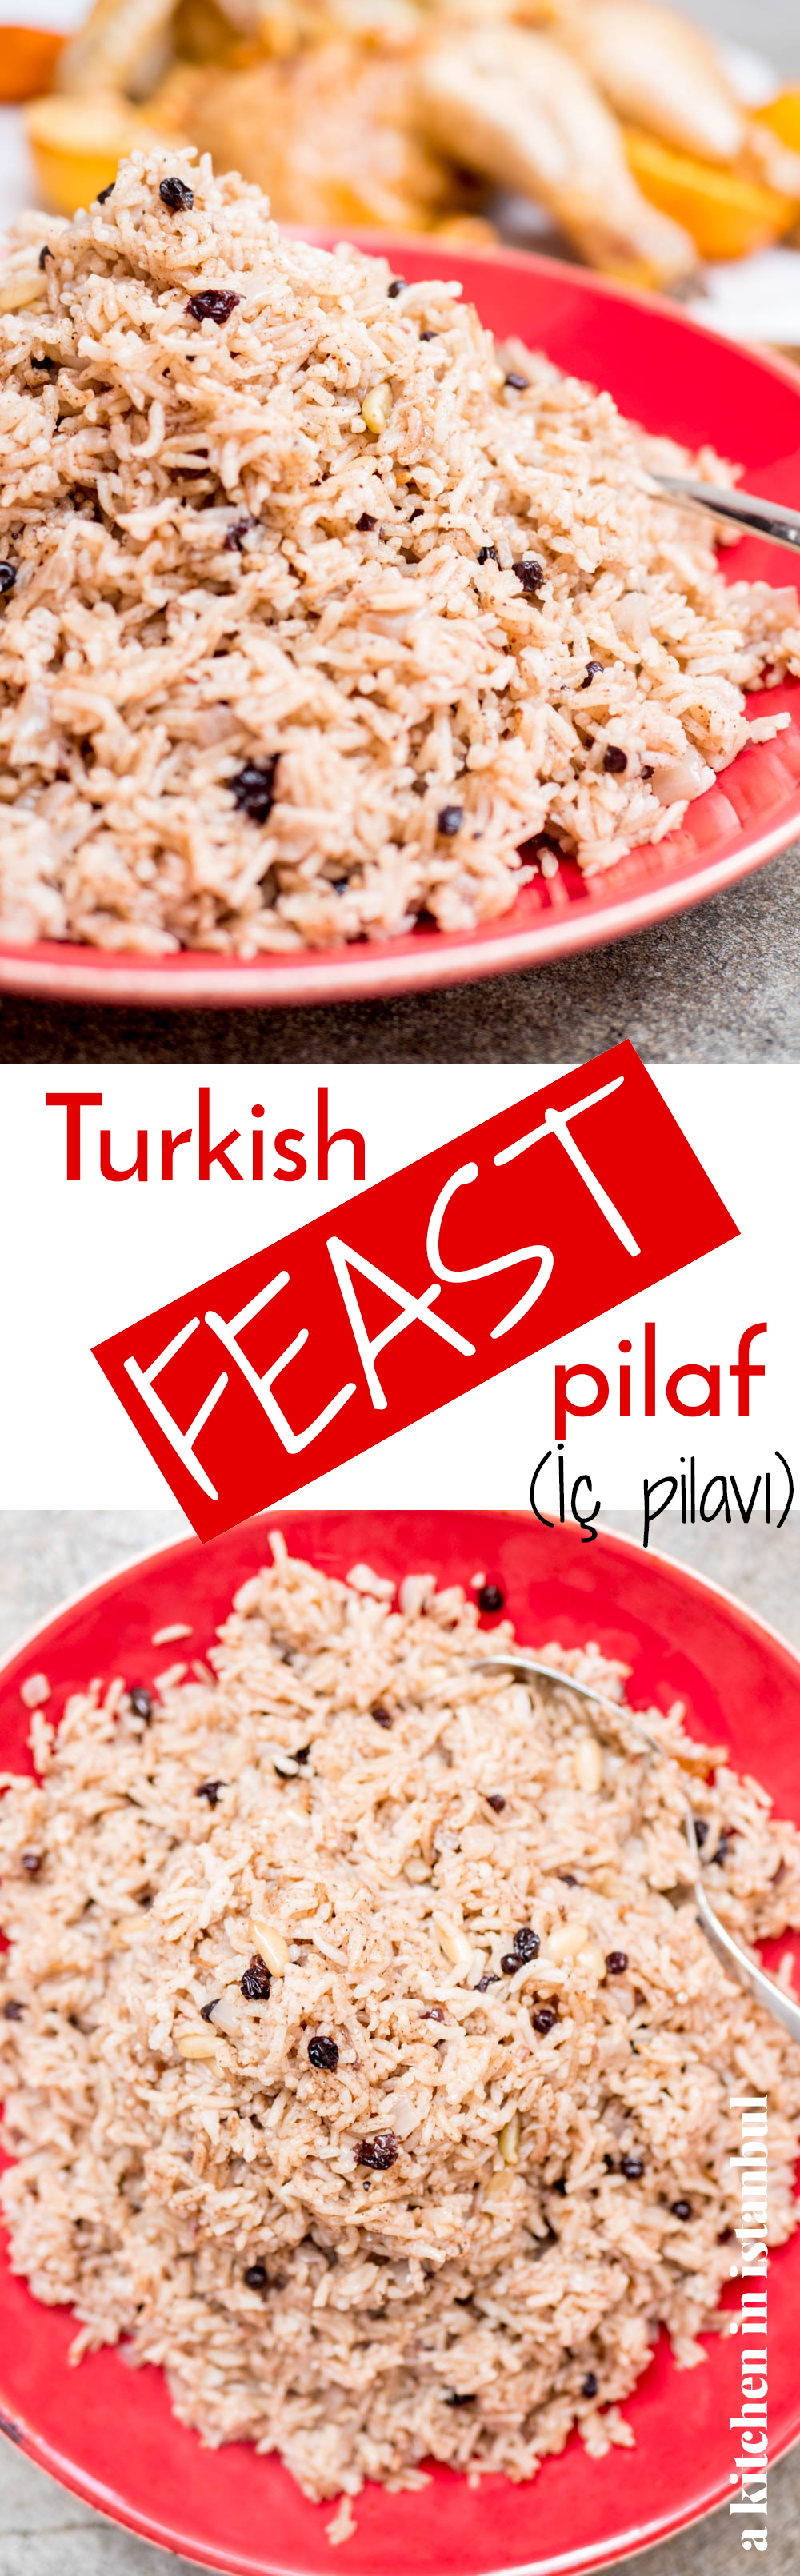 Turkish feast pilaf (İç pilavı) - recipe / A kitchen in Istanbul